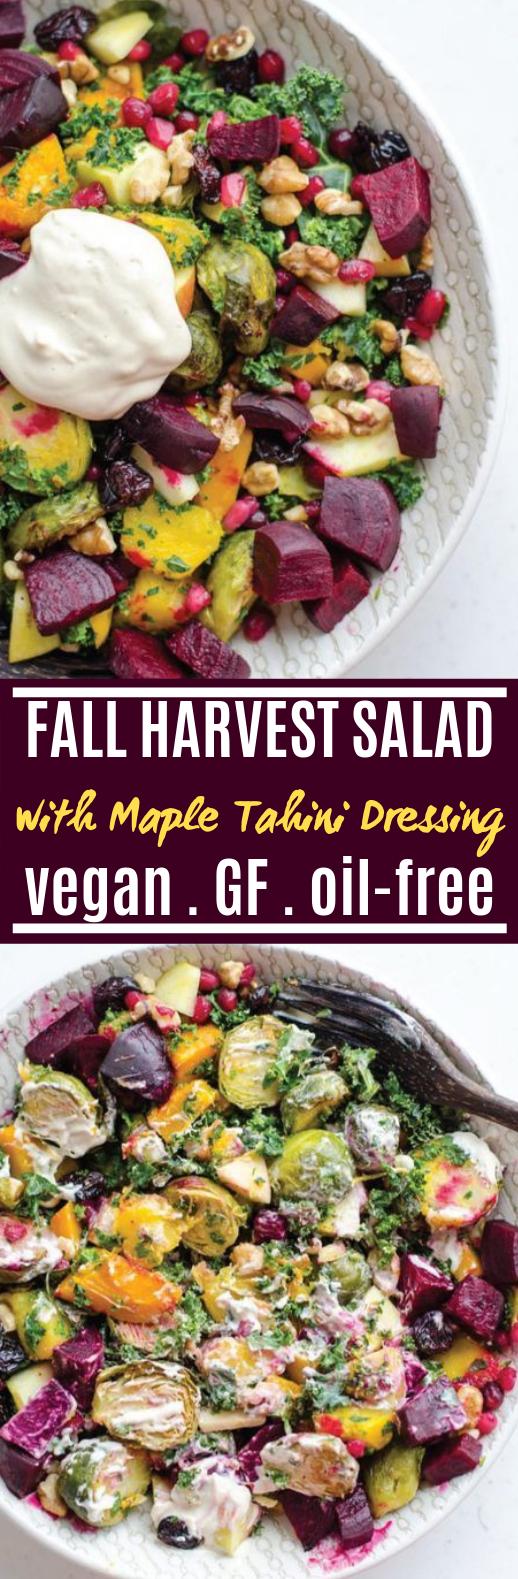 Fall Harvest Salad with Maple Tahini Dressing #healthy #salad